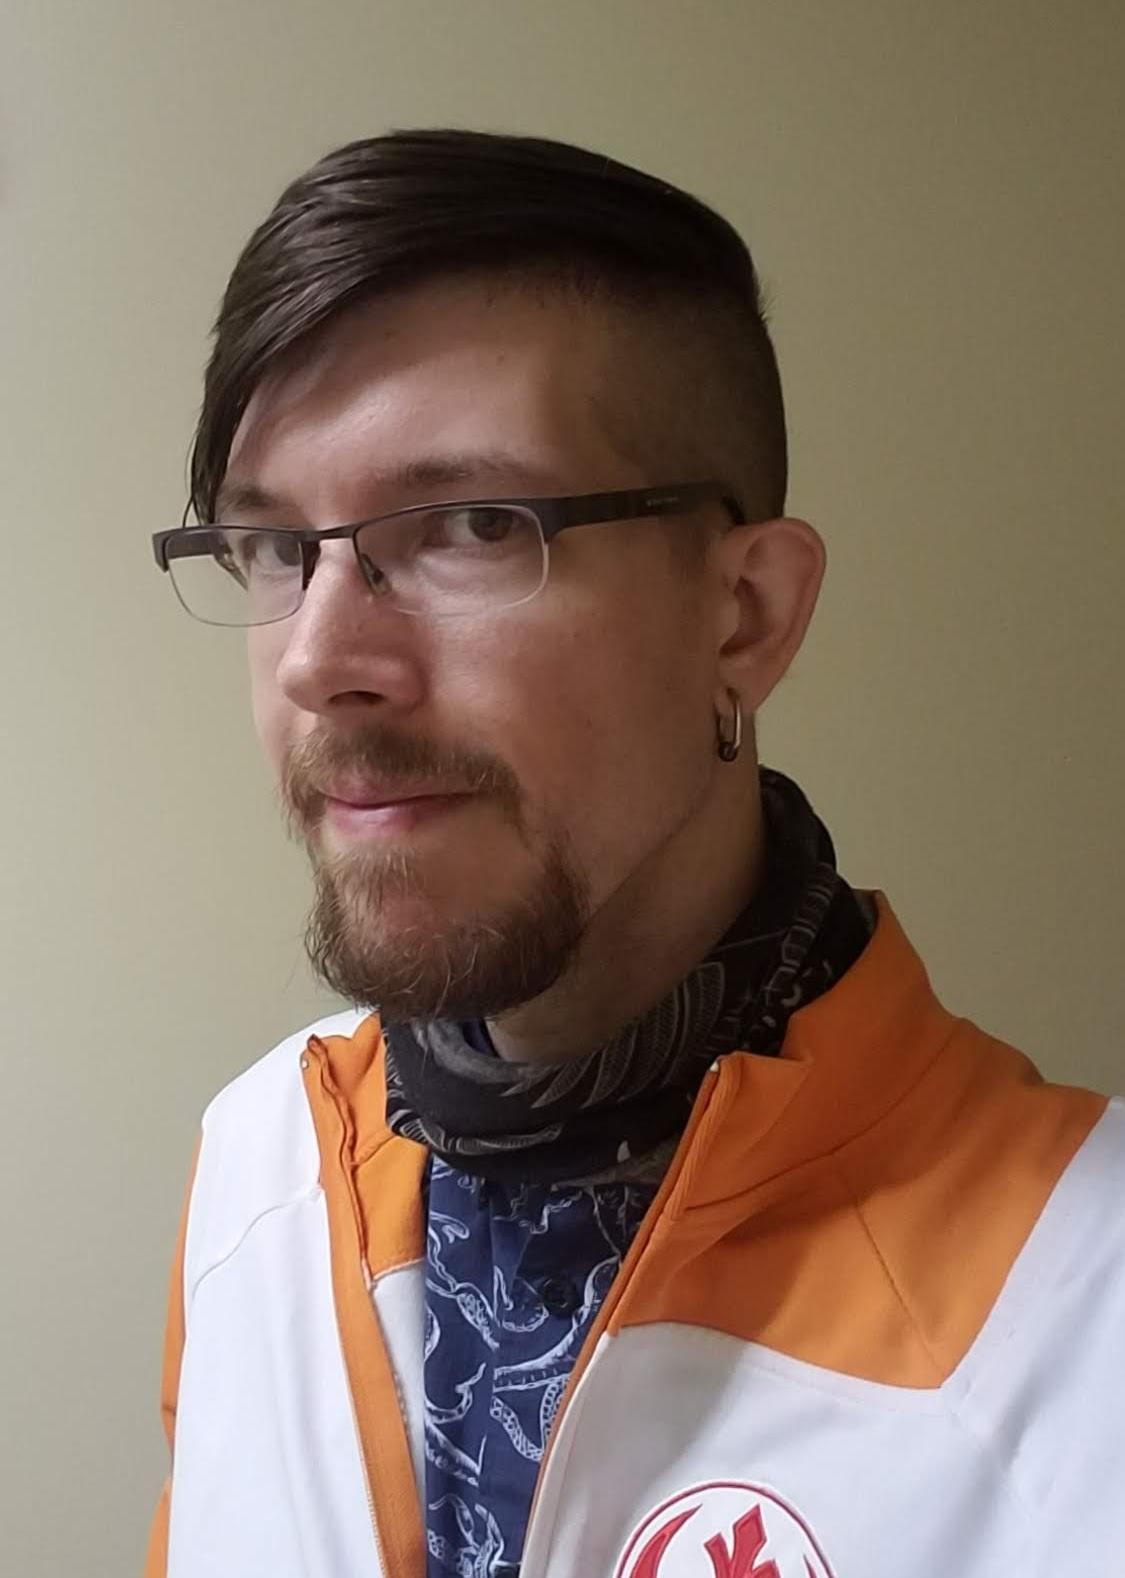 Image of the host wearing half-framed rectangular glasses, a blue shirt, and an orange Rebel Alliance jacket.